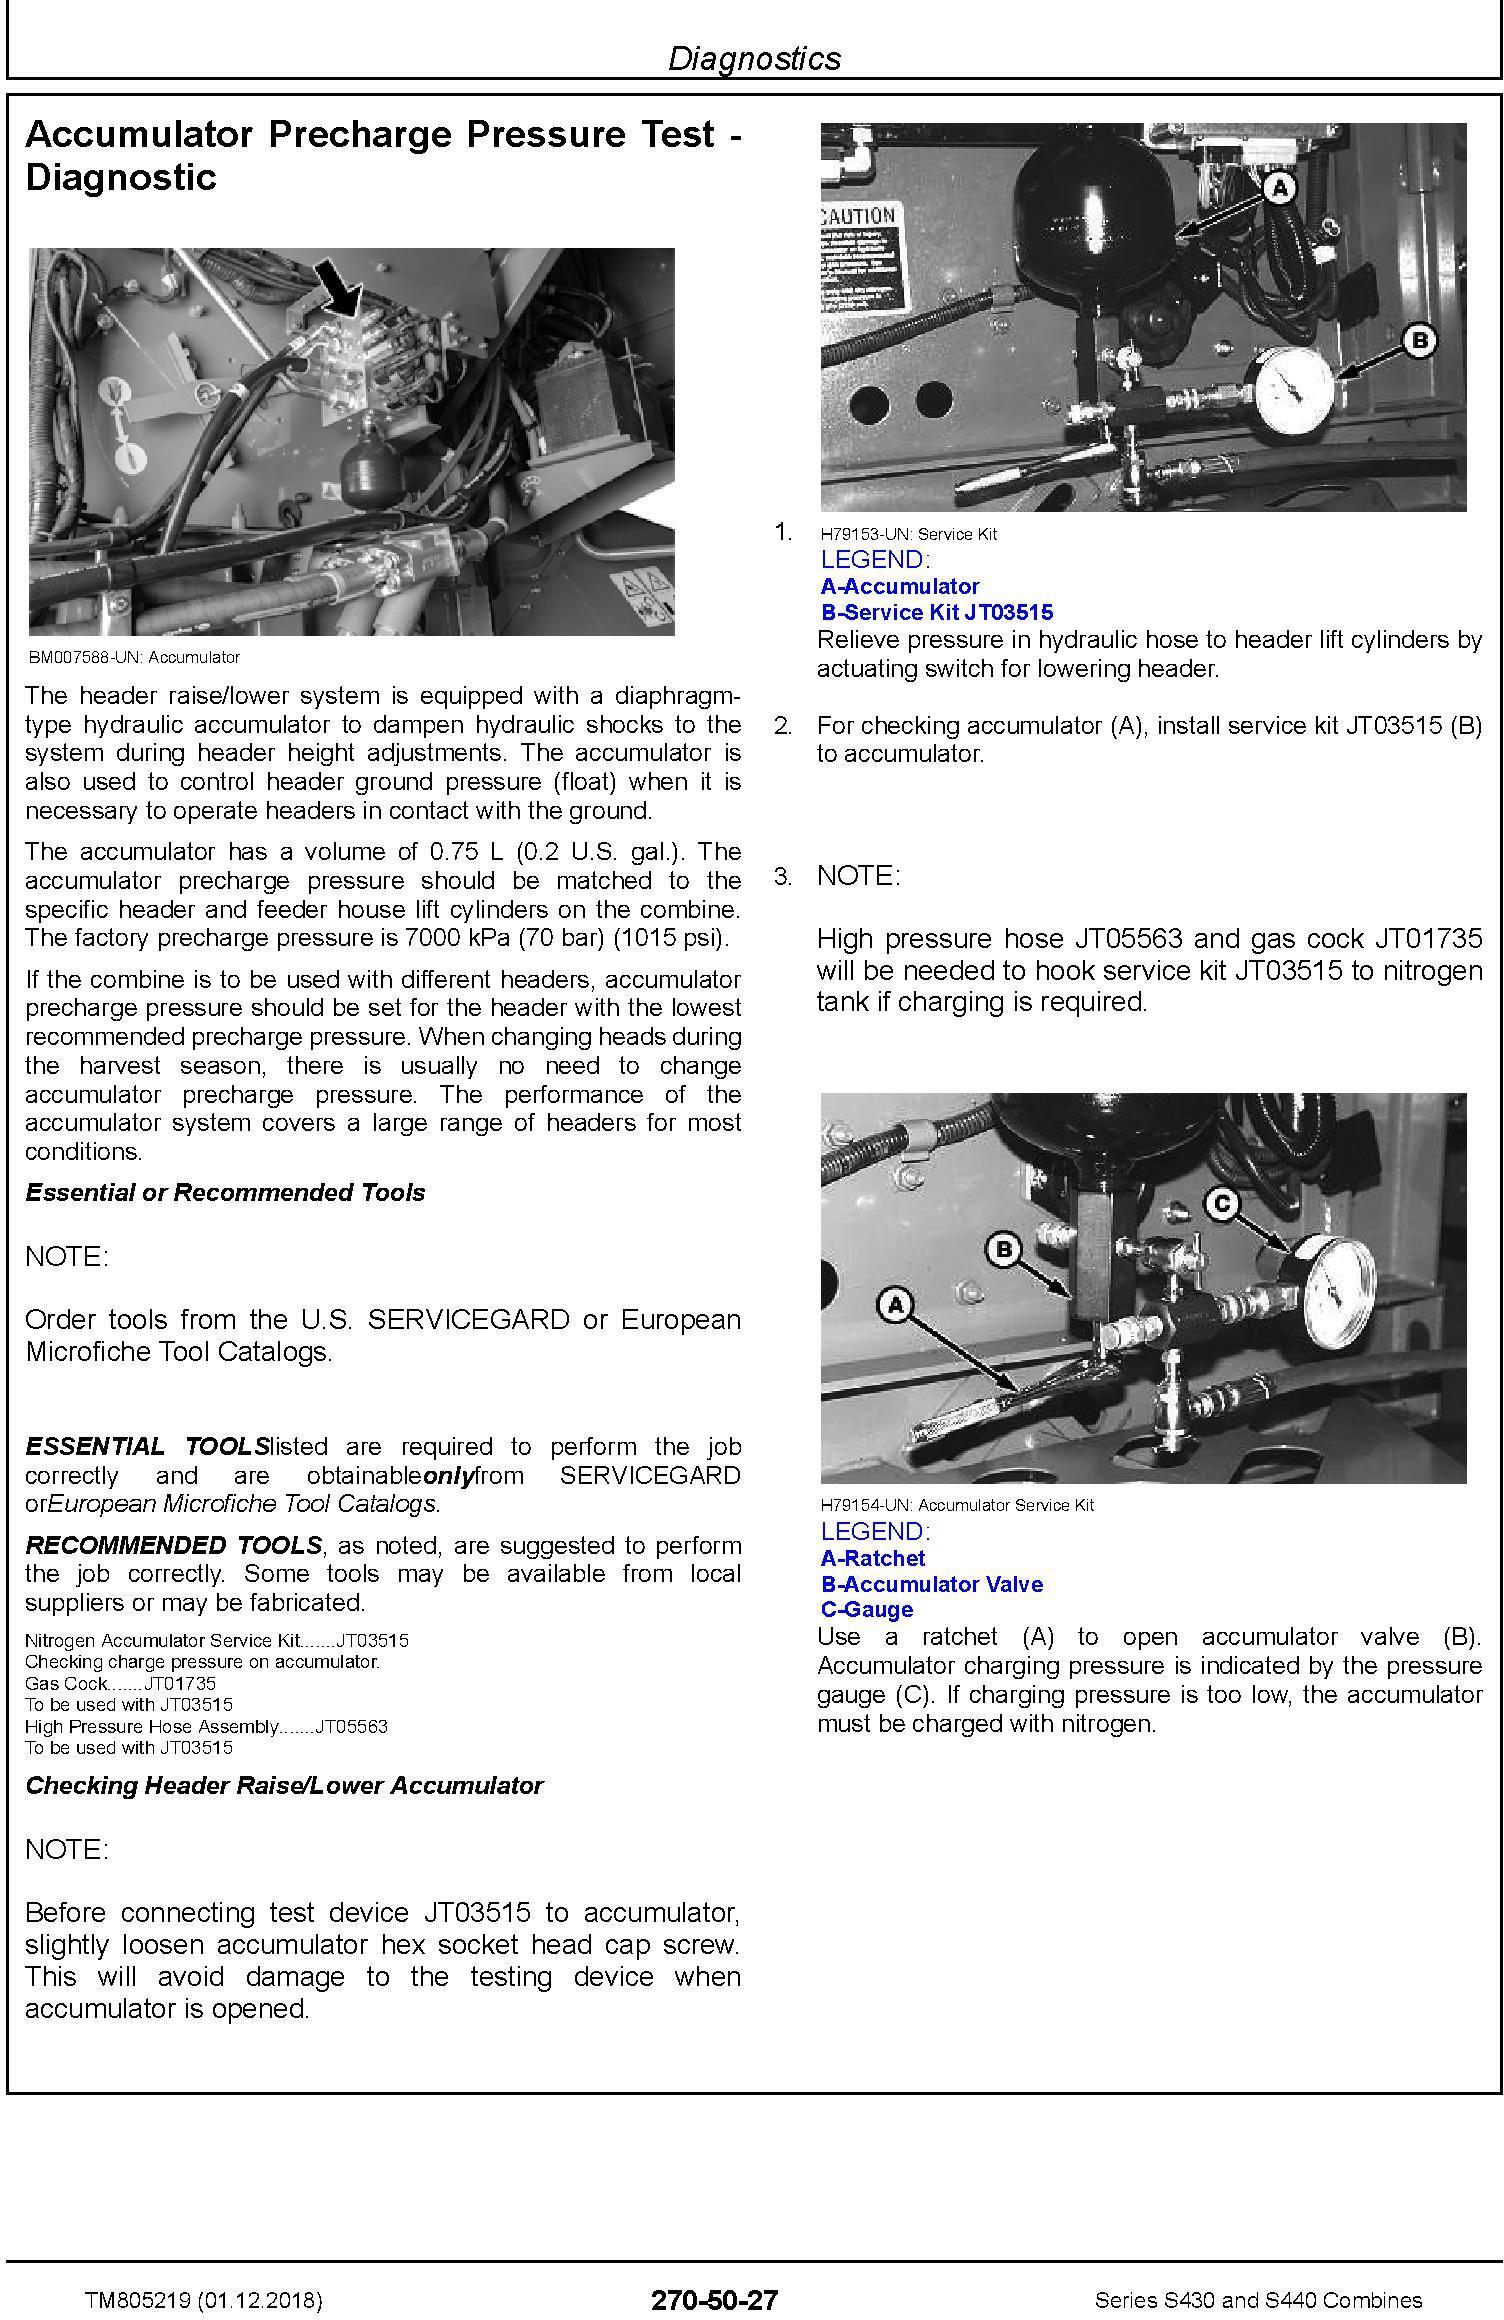 John Deere S430 and S440 Combines Diagnostic Technical Service Manual (TM805219) - 3